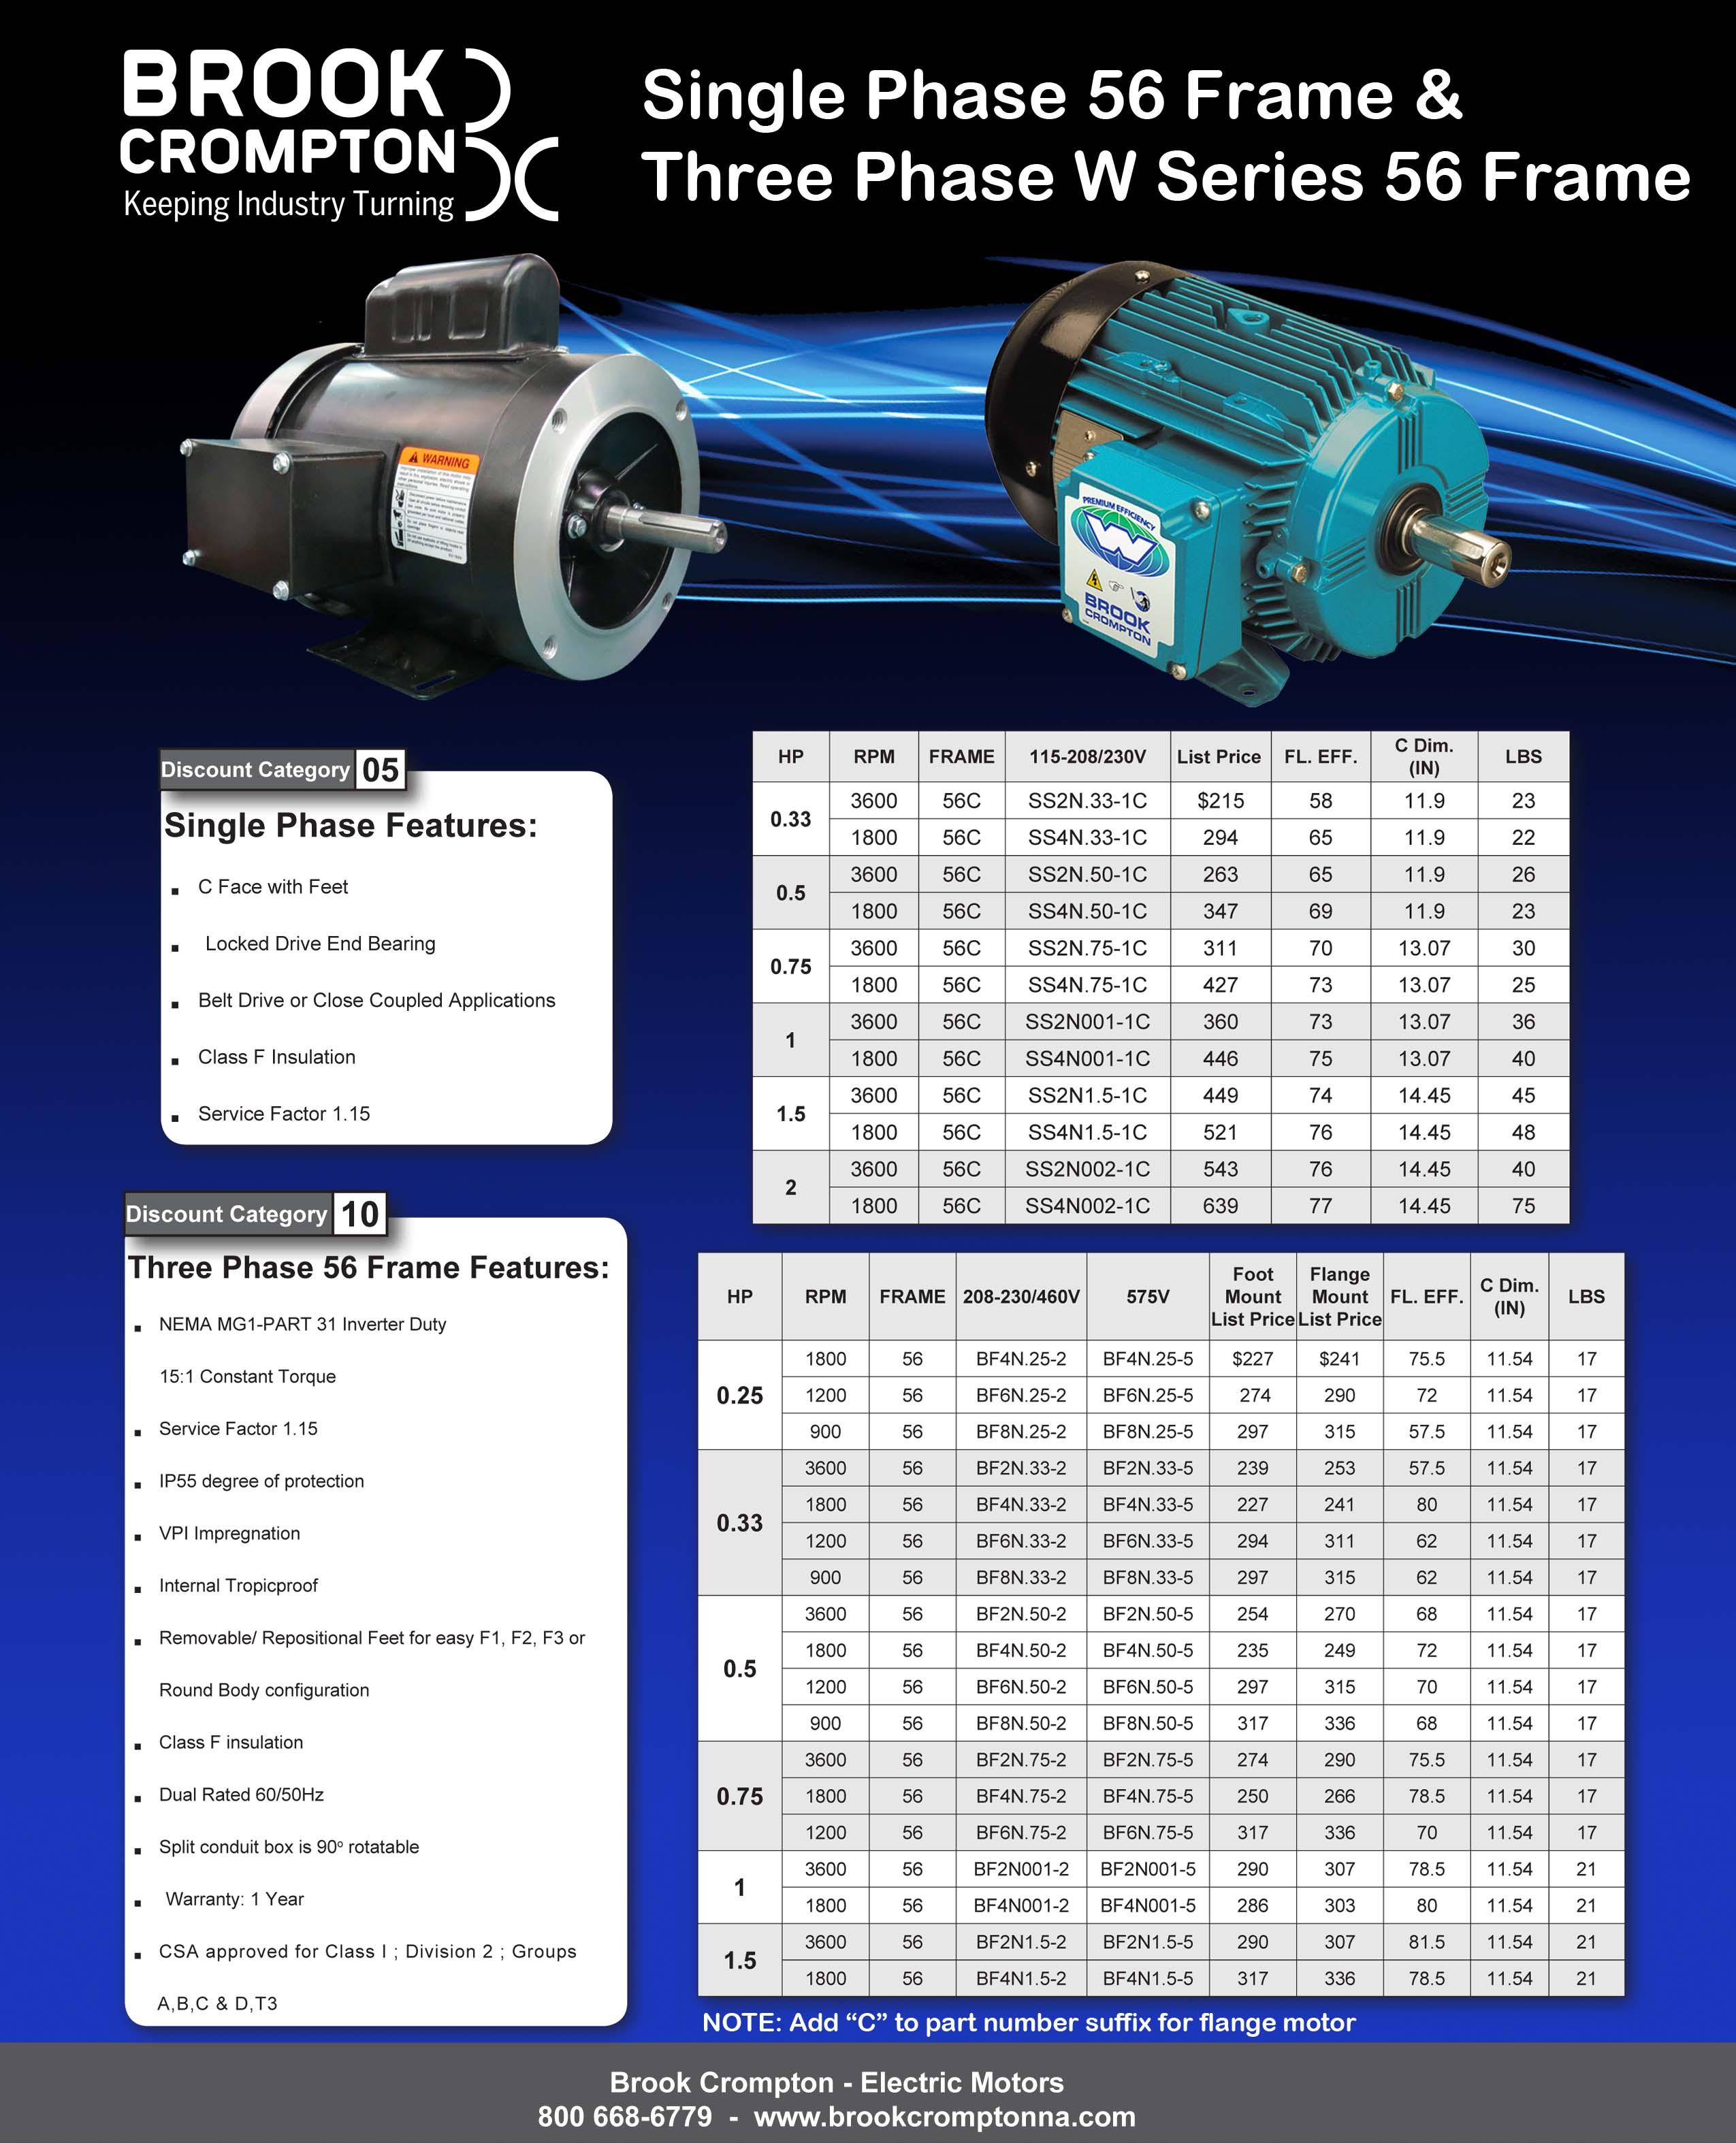 Brook crompton americas electric motors catalog for Us electrical motors catalog